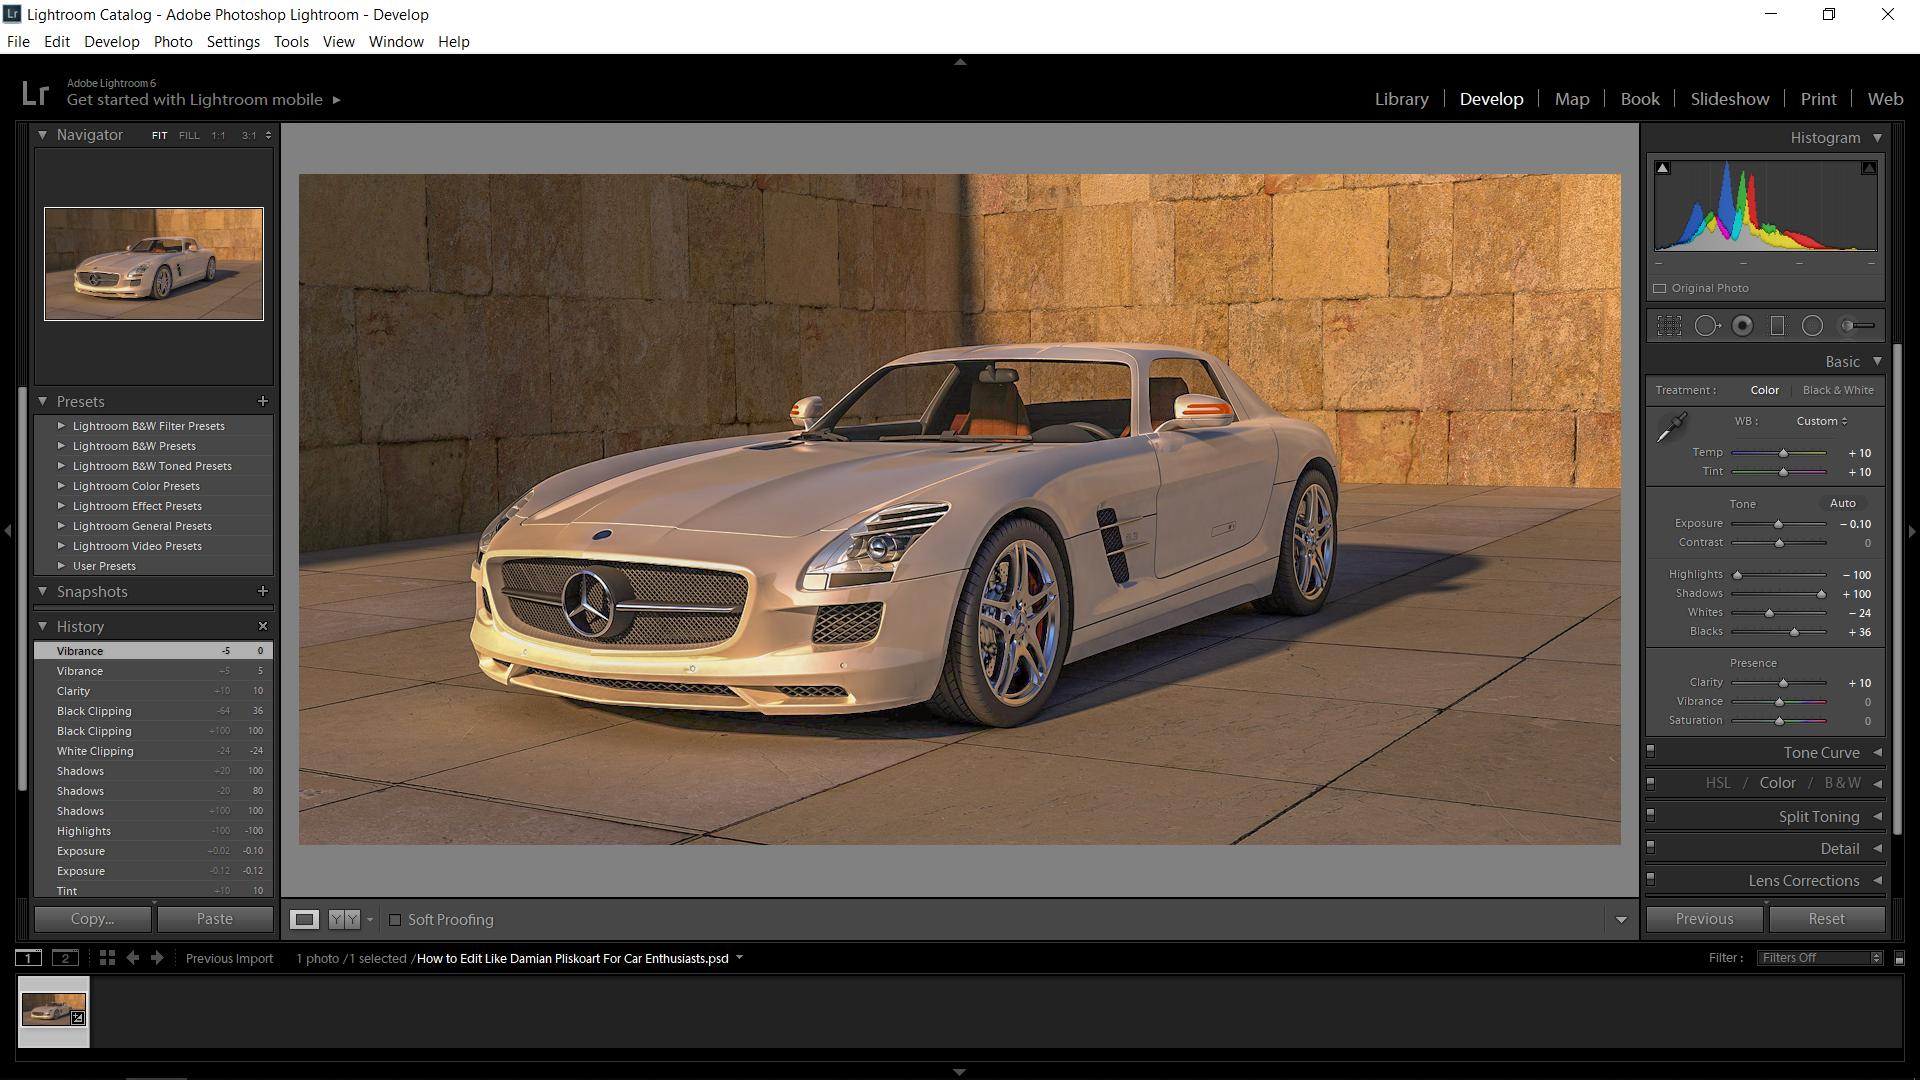 Edit Like Damian Pliskoart For Car Enthusiasts